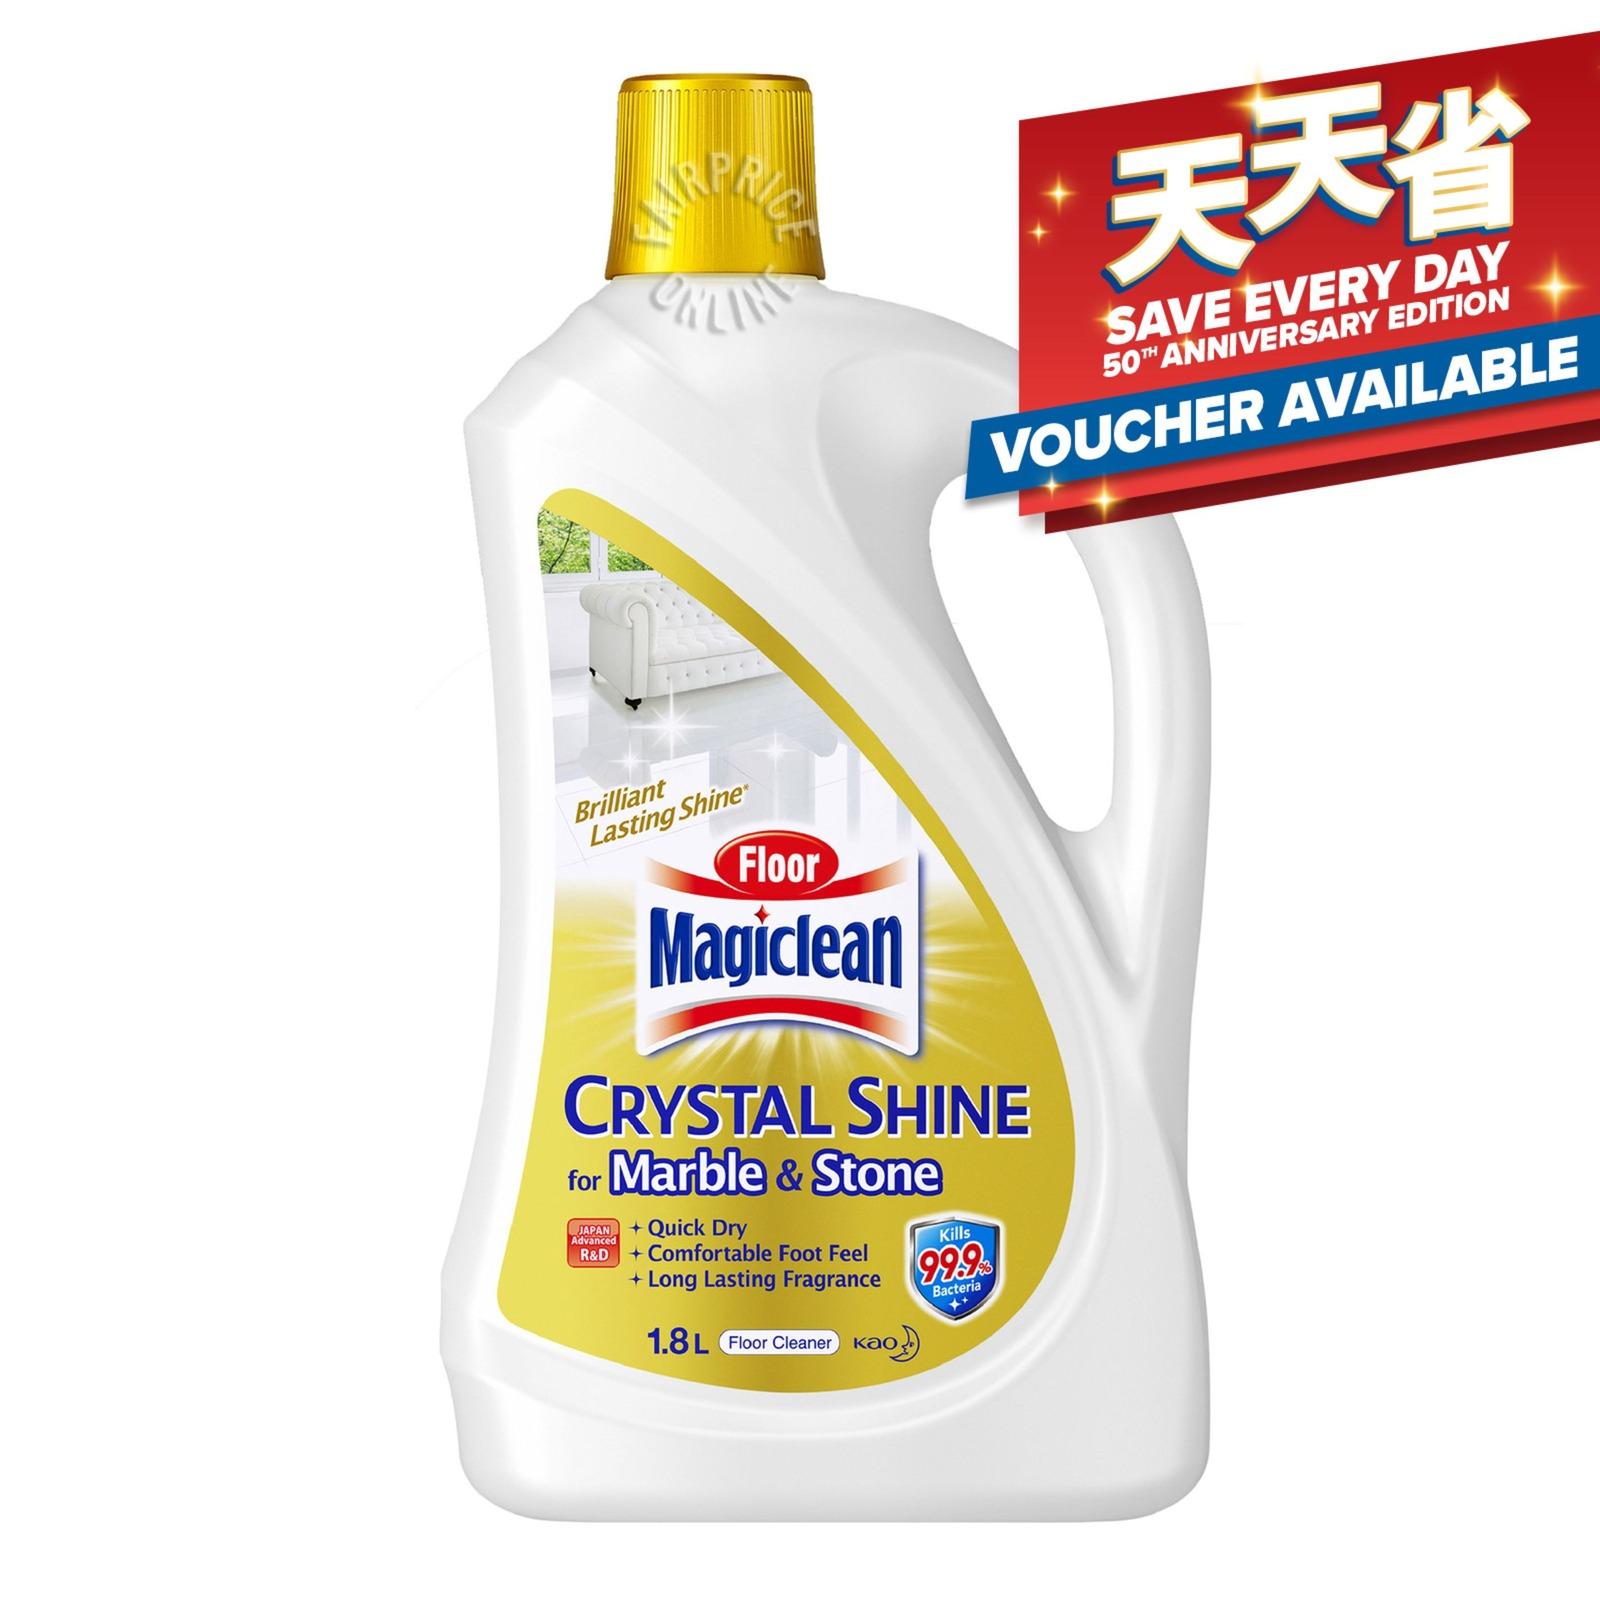 Magiclean Floor Cleaner - Crystal Shine